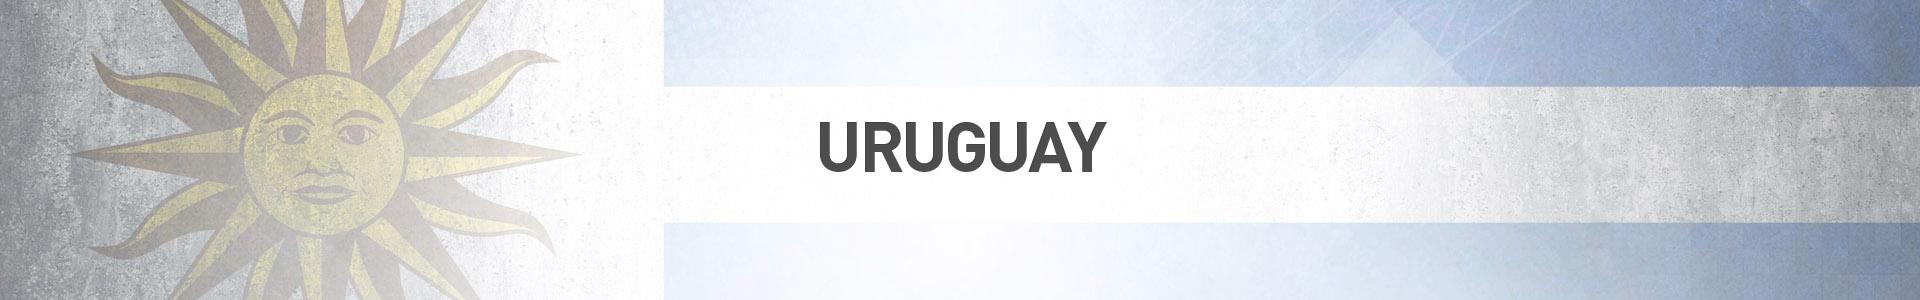 Topo-Pais-Uruguay-SBA